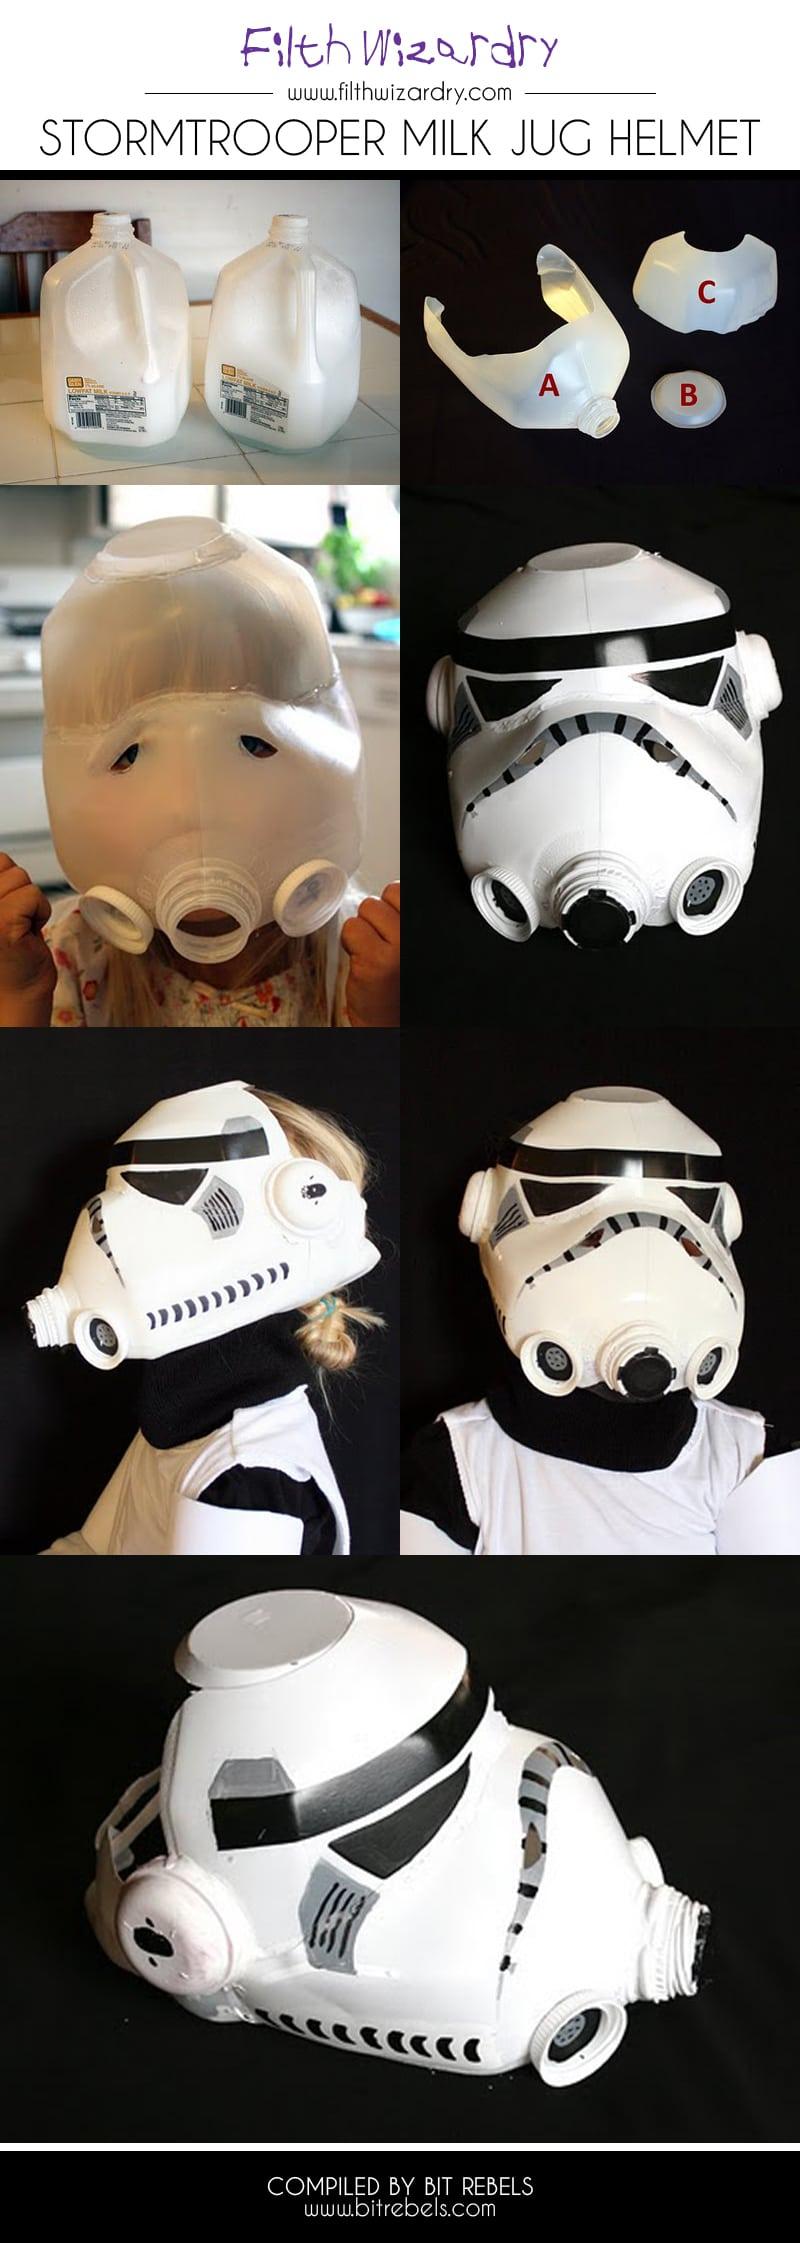 stormtrooper-helmet-milk-jug-project